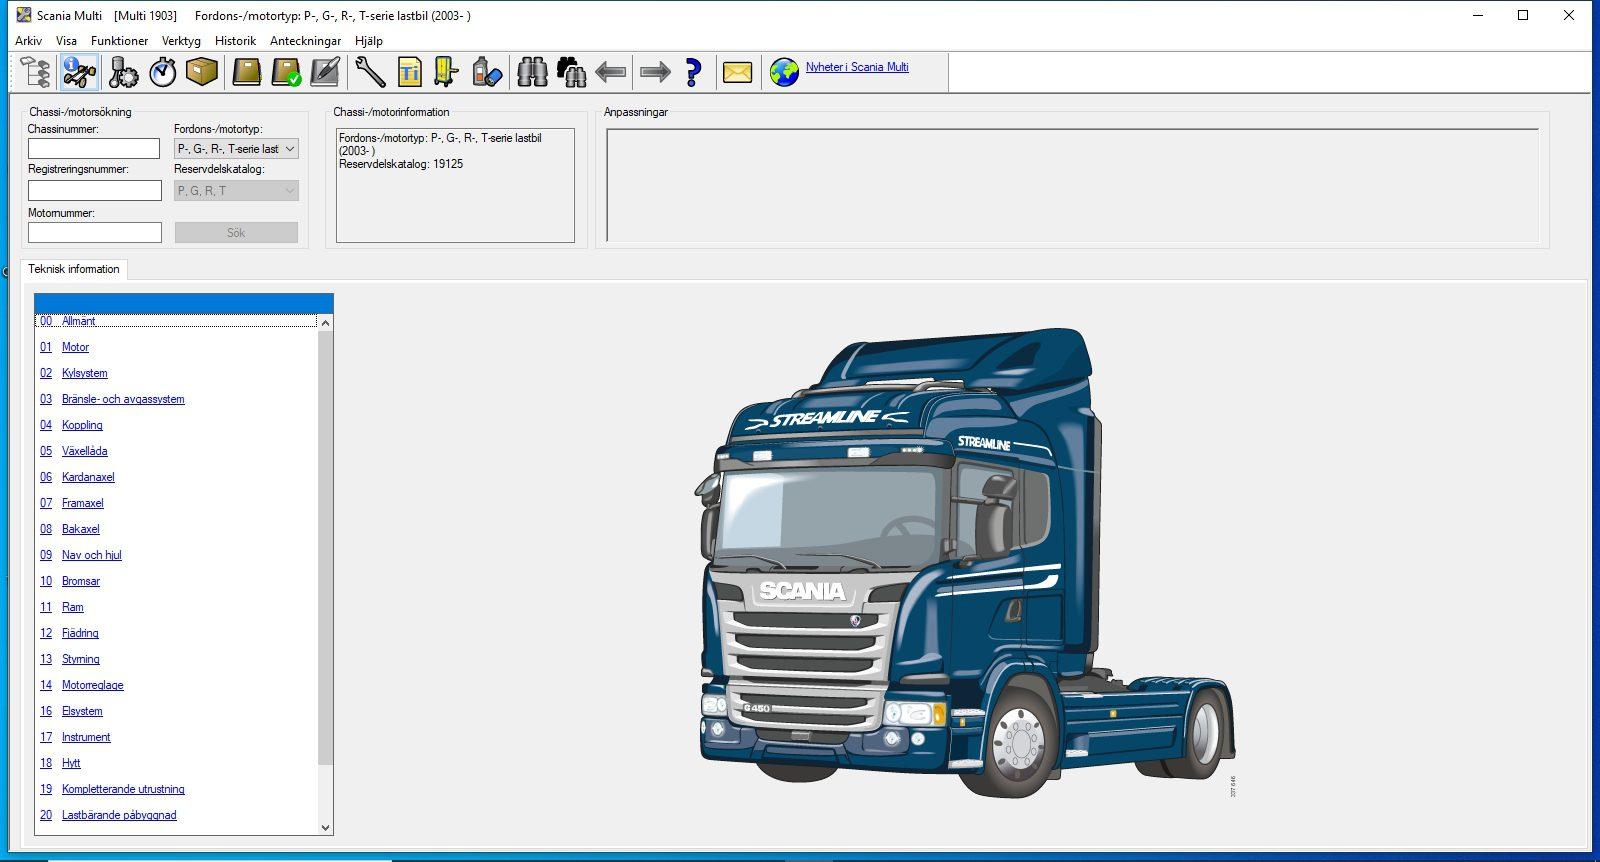 Scania_Multi_032019_Full_Instruction_1